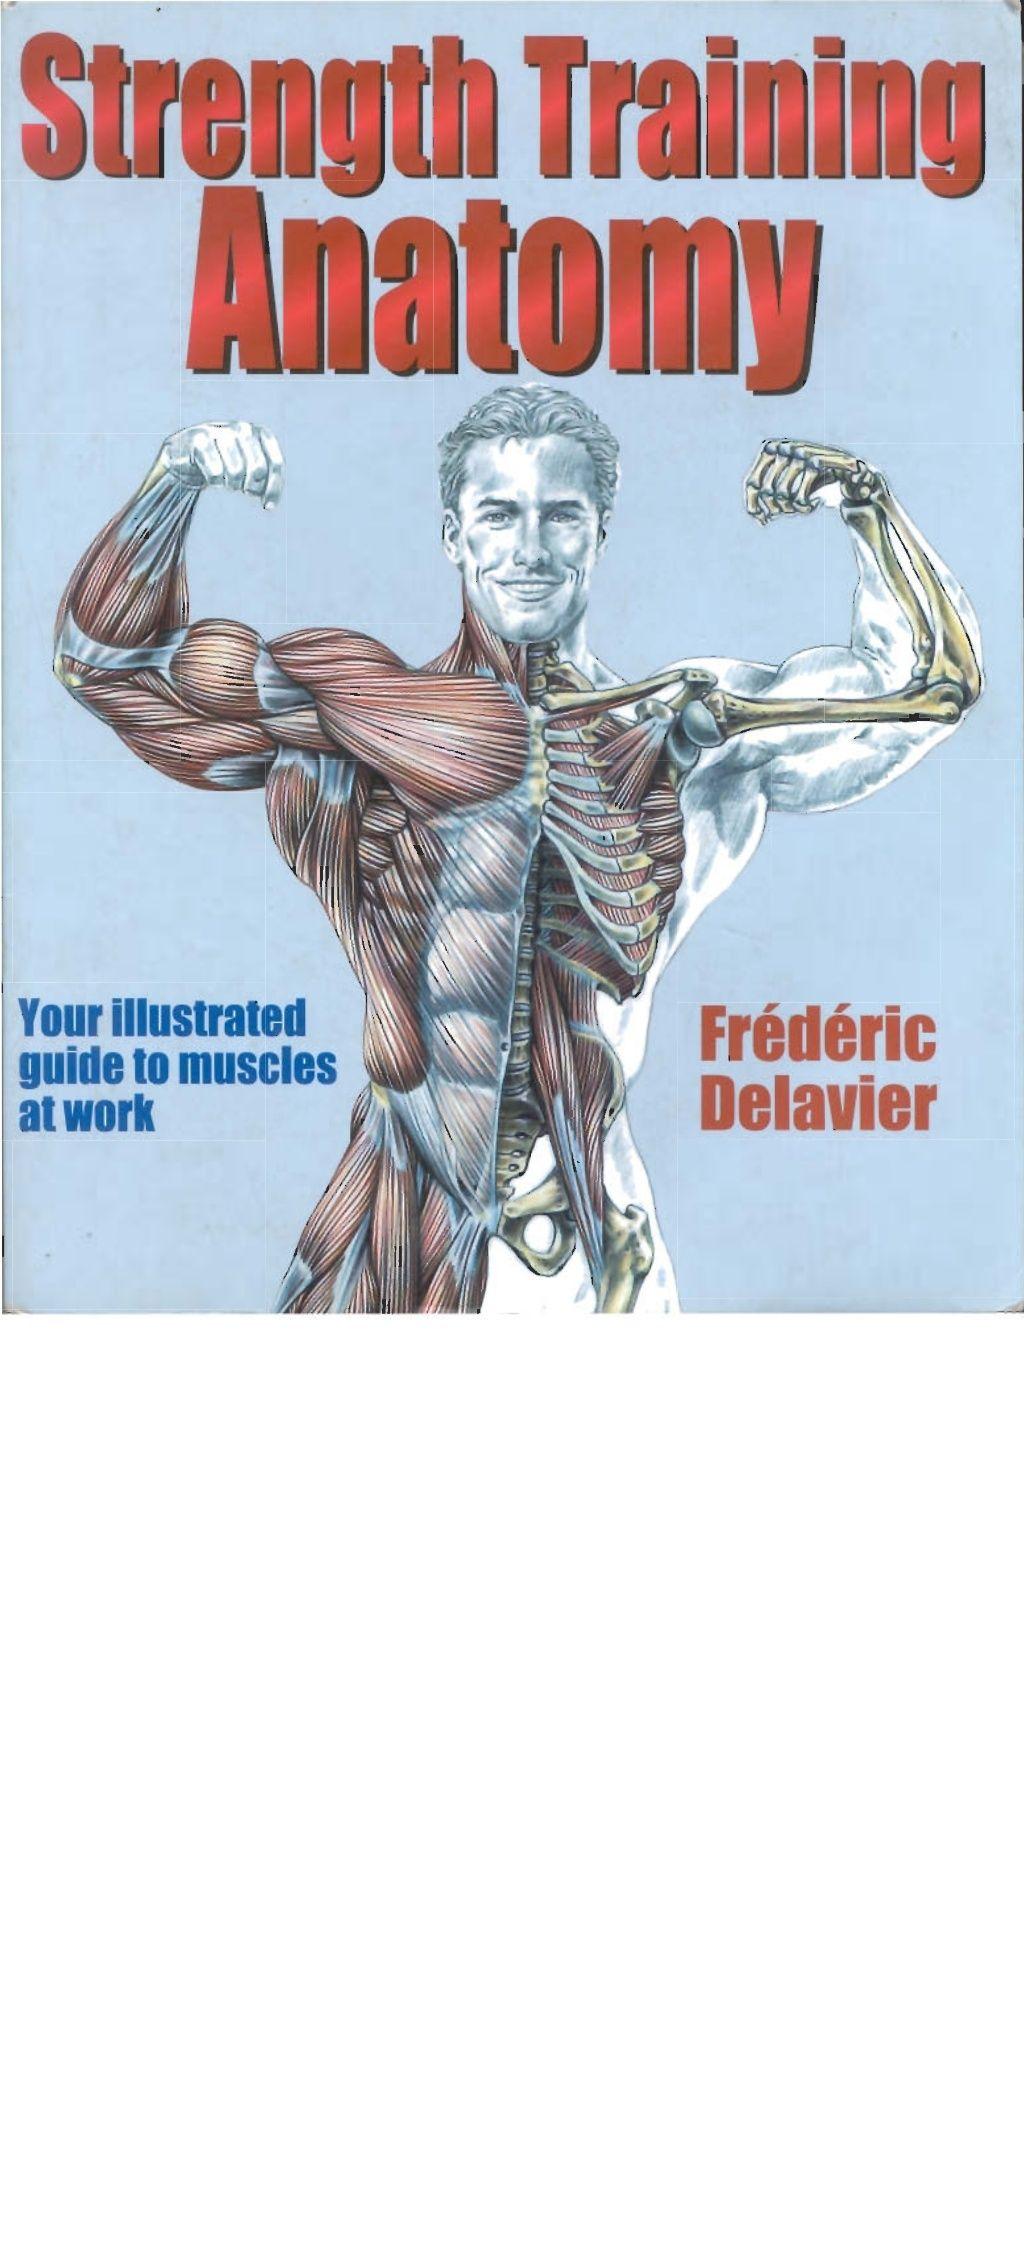 Frederic Delavier Strength Training Anatomy By Laurent Dkatware Via